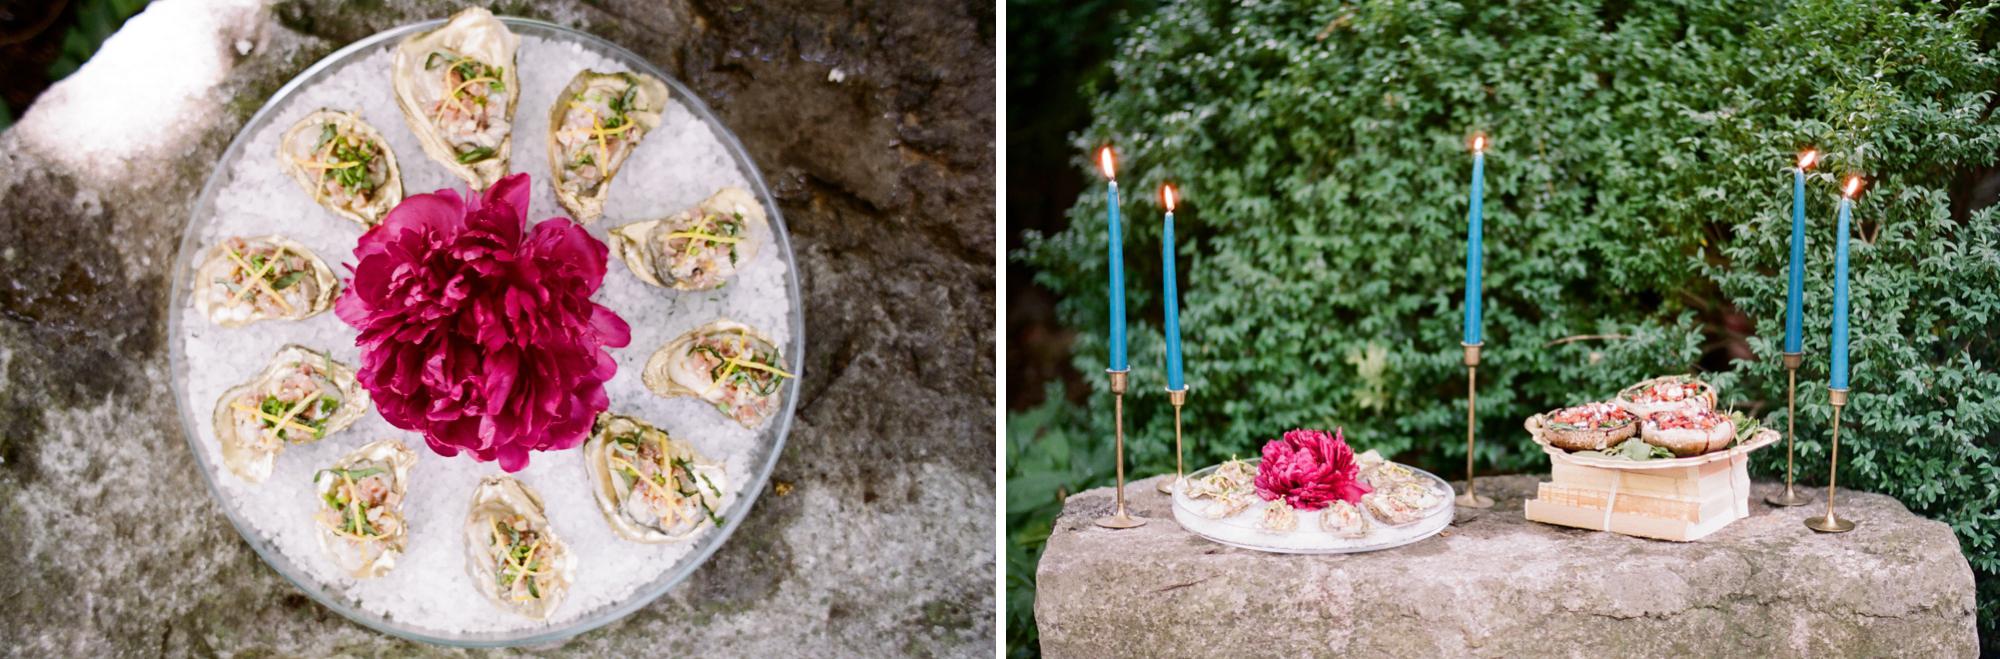 alice in wonderland wedding inspiration_0020